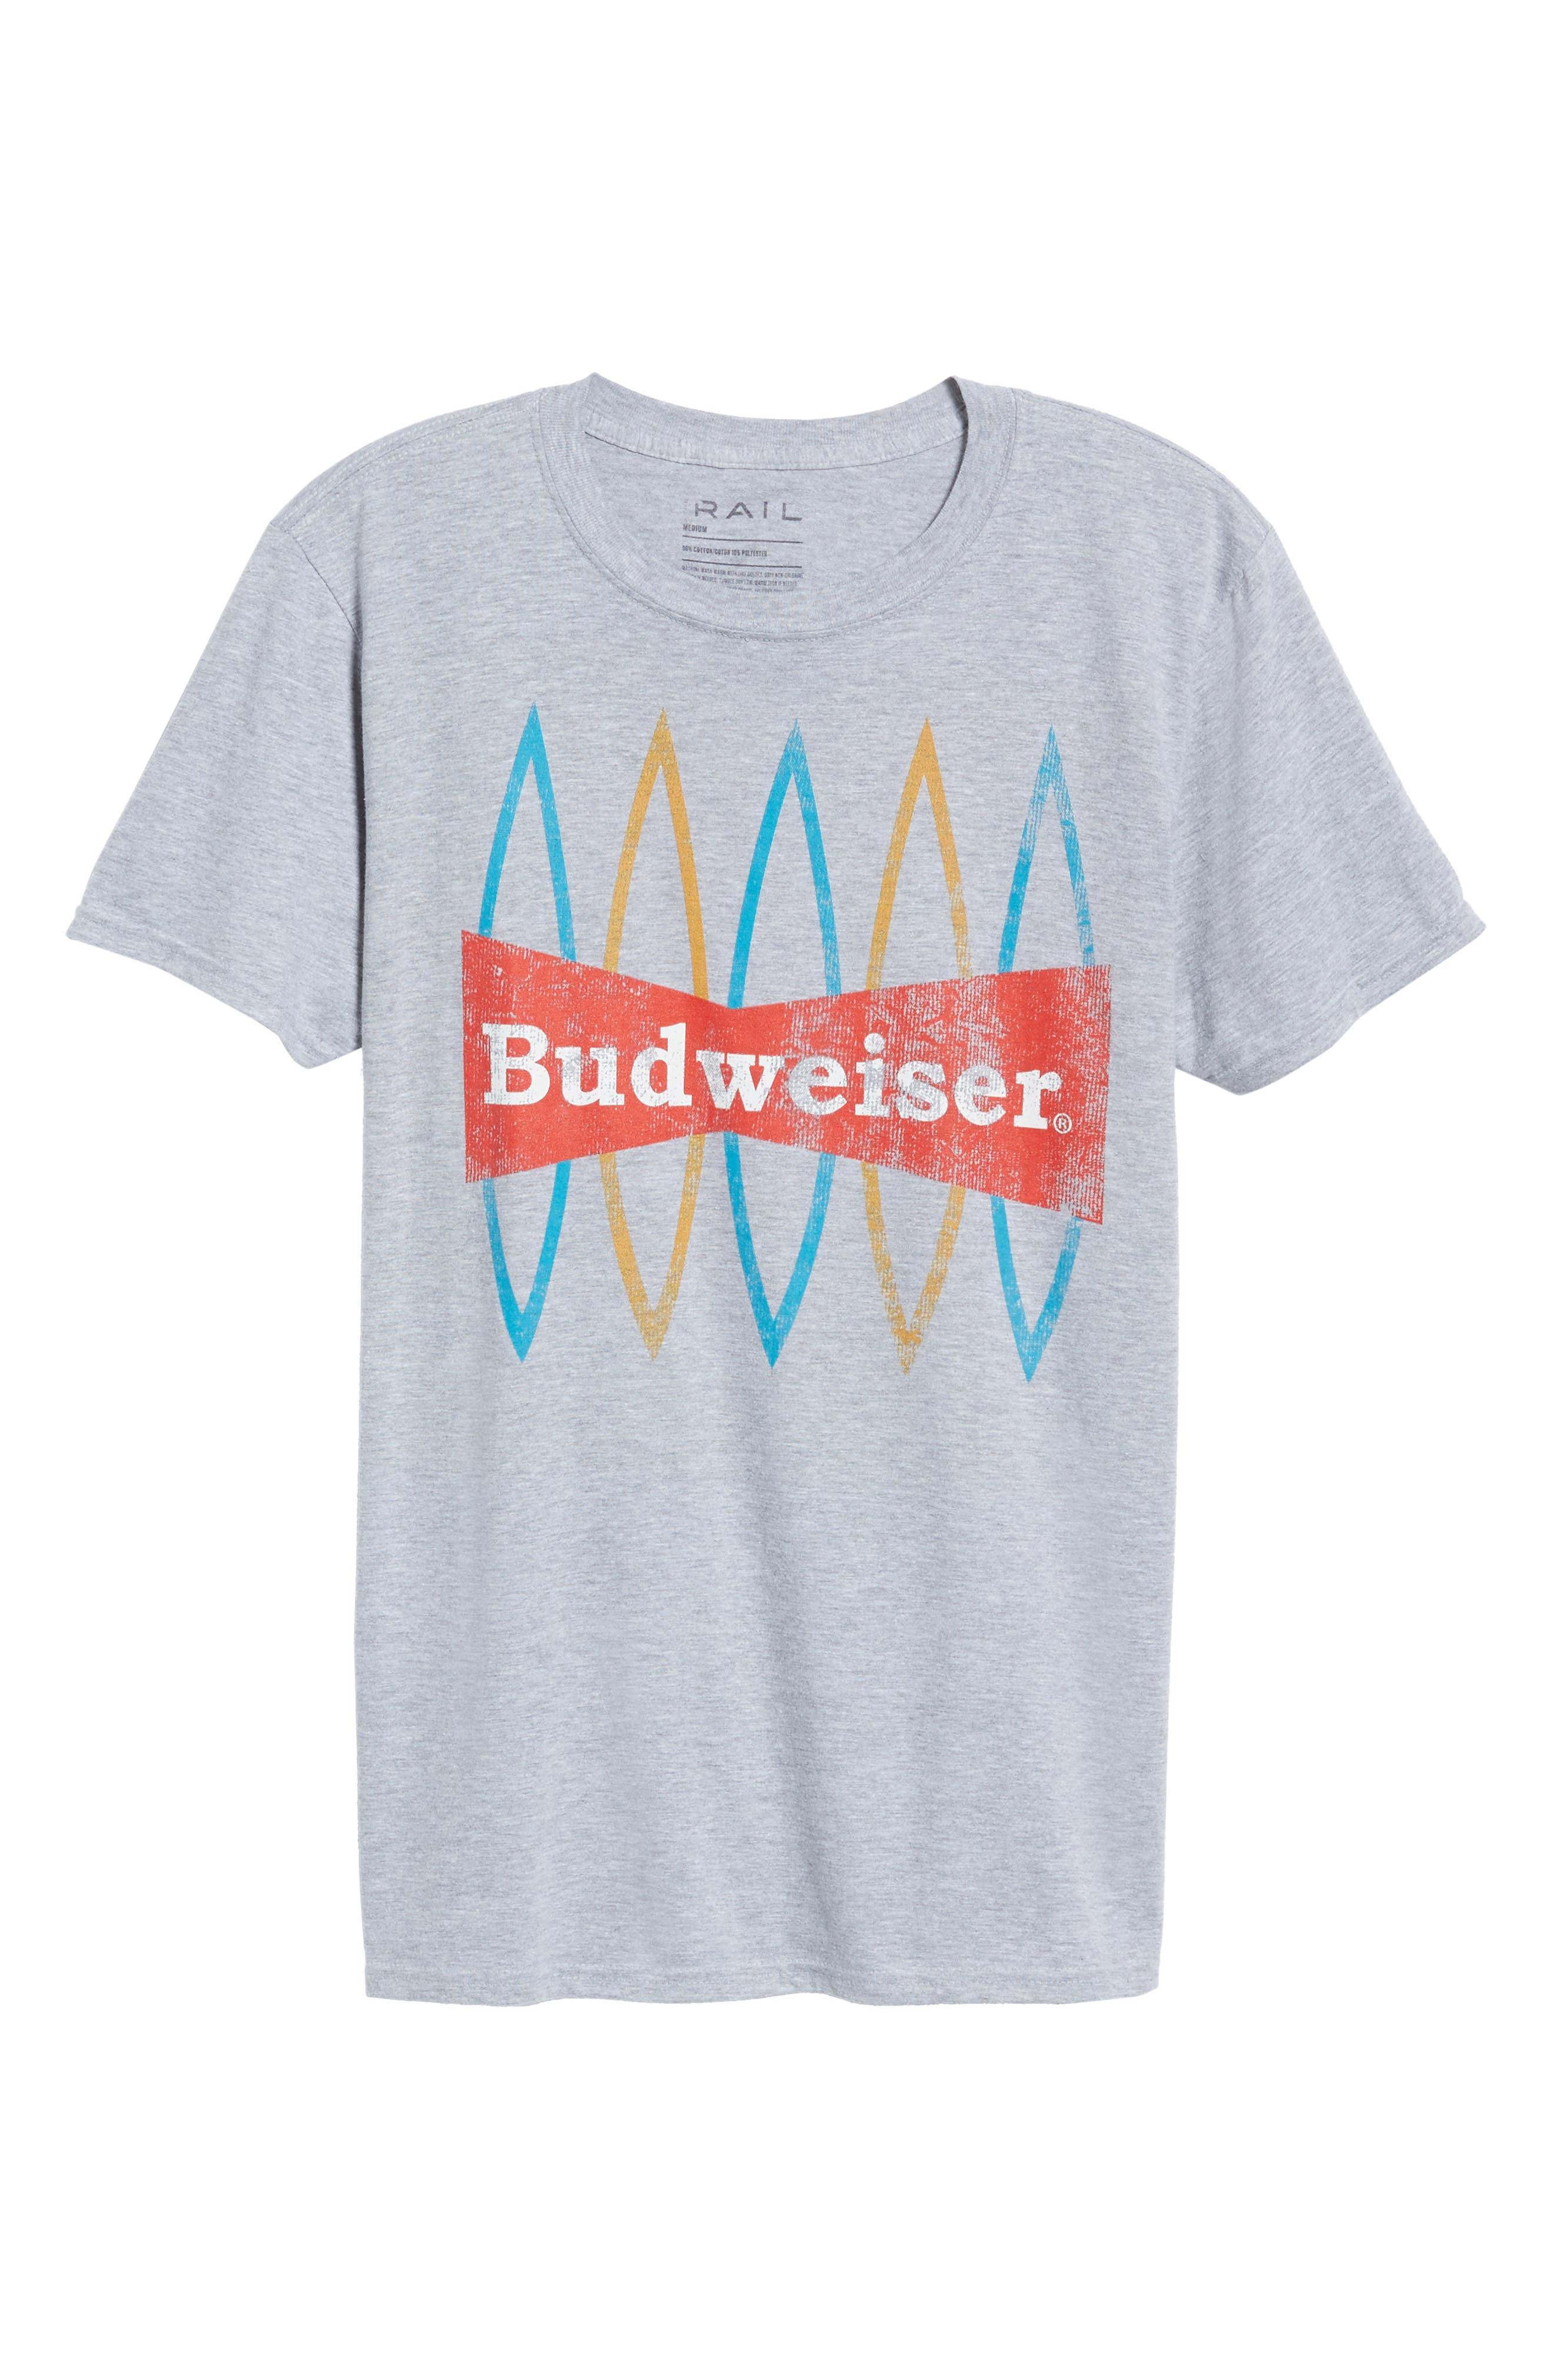 Budweiser<sup>®</sup> T-Shirt,                             Alternate thumbnail 6, color,                             030